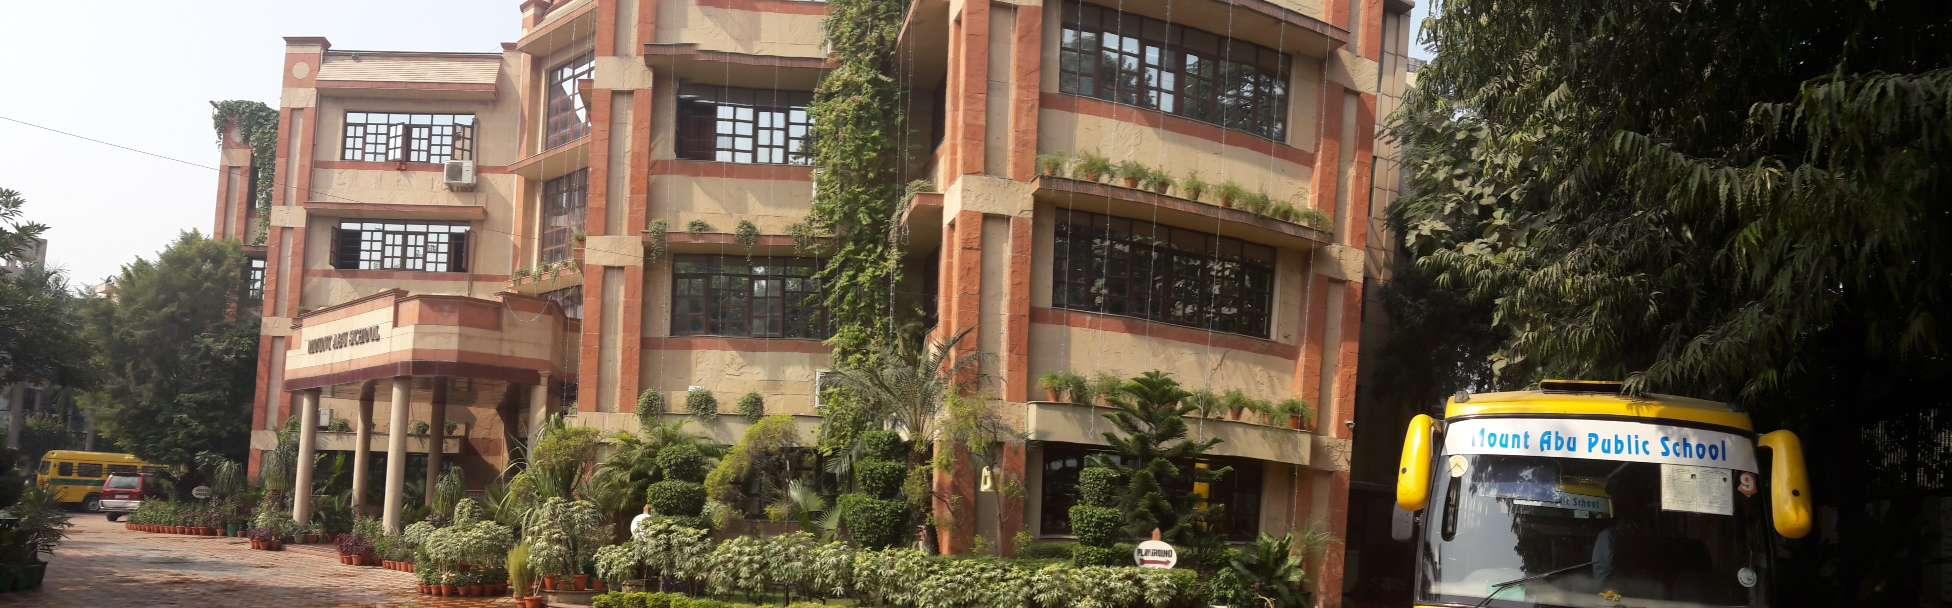 MOUNT ABU PUBLIC SCHOOL SECTOR 5 POCKET B 8 ROHINI DELHI 2730397